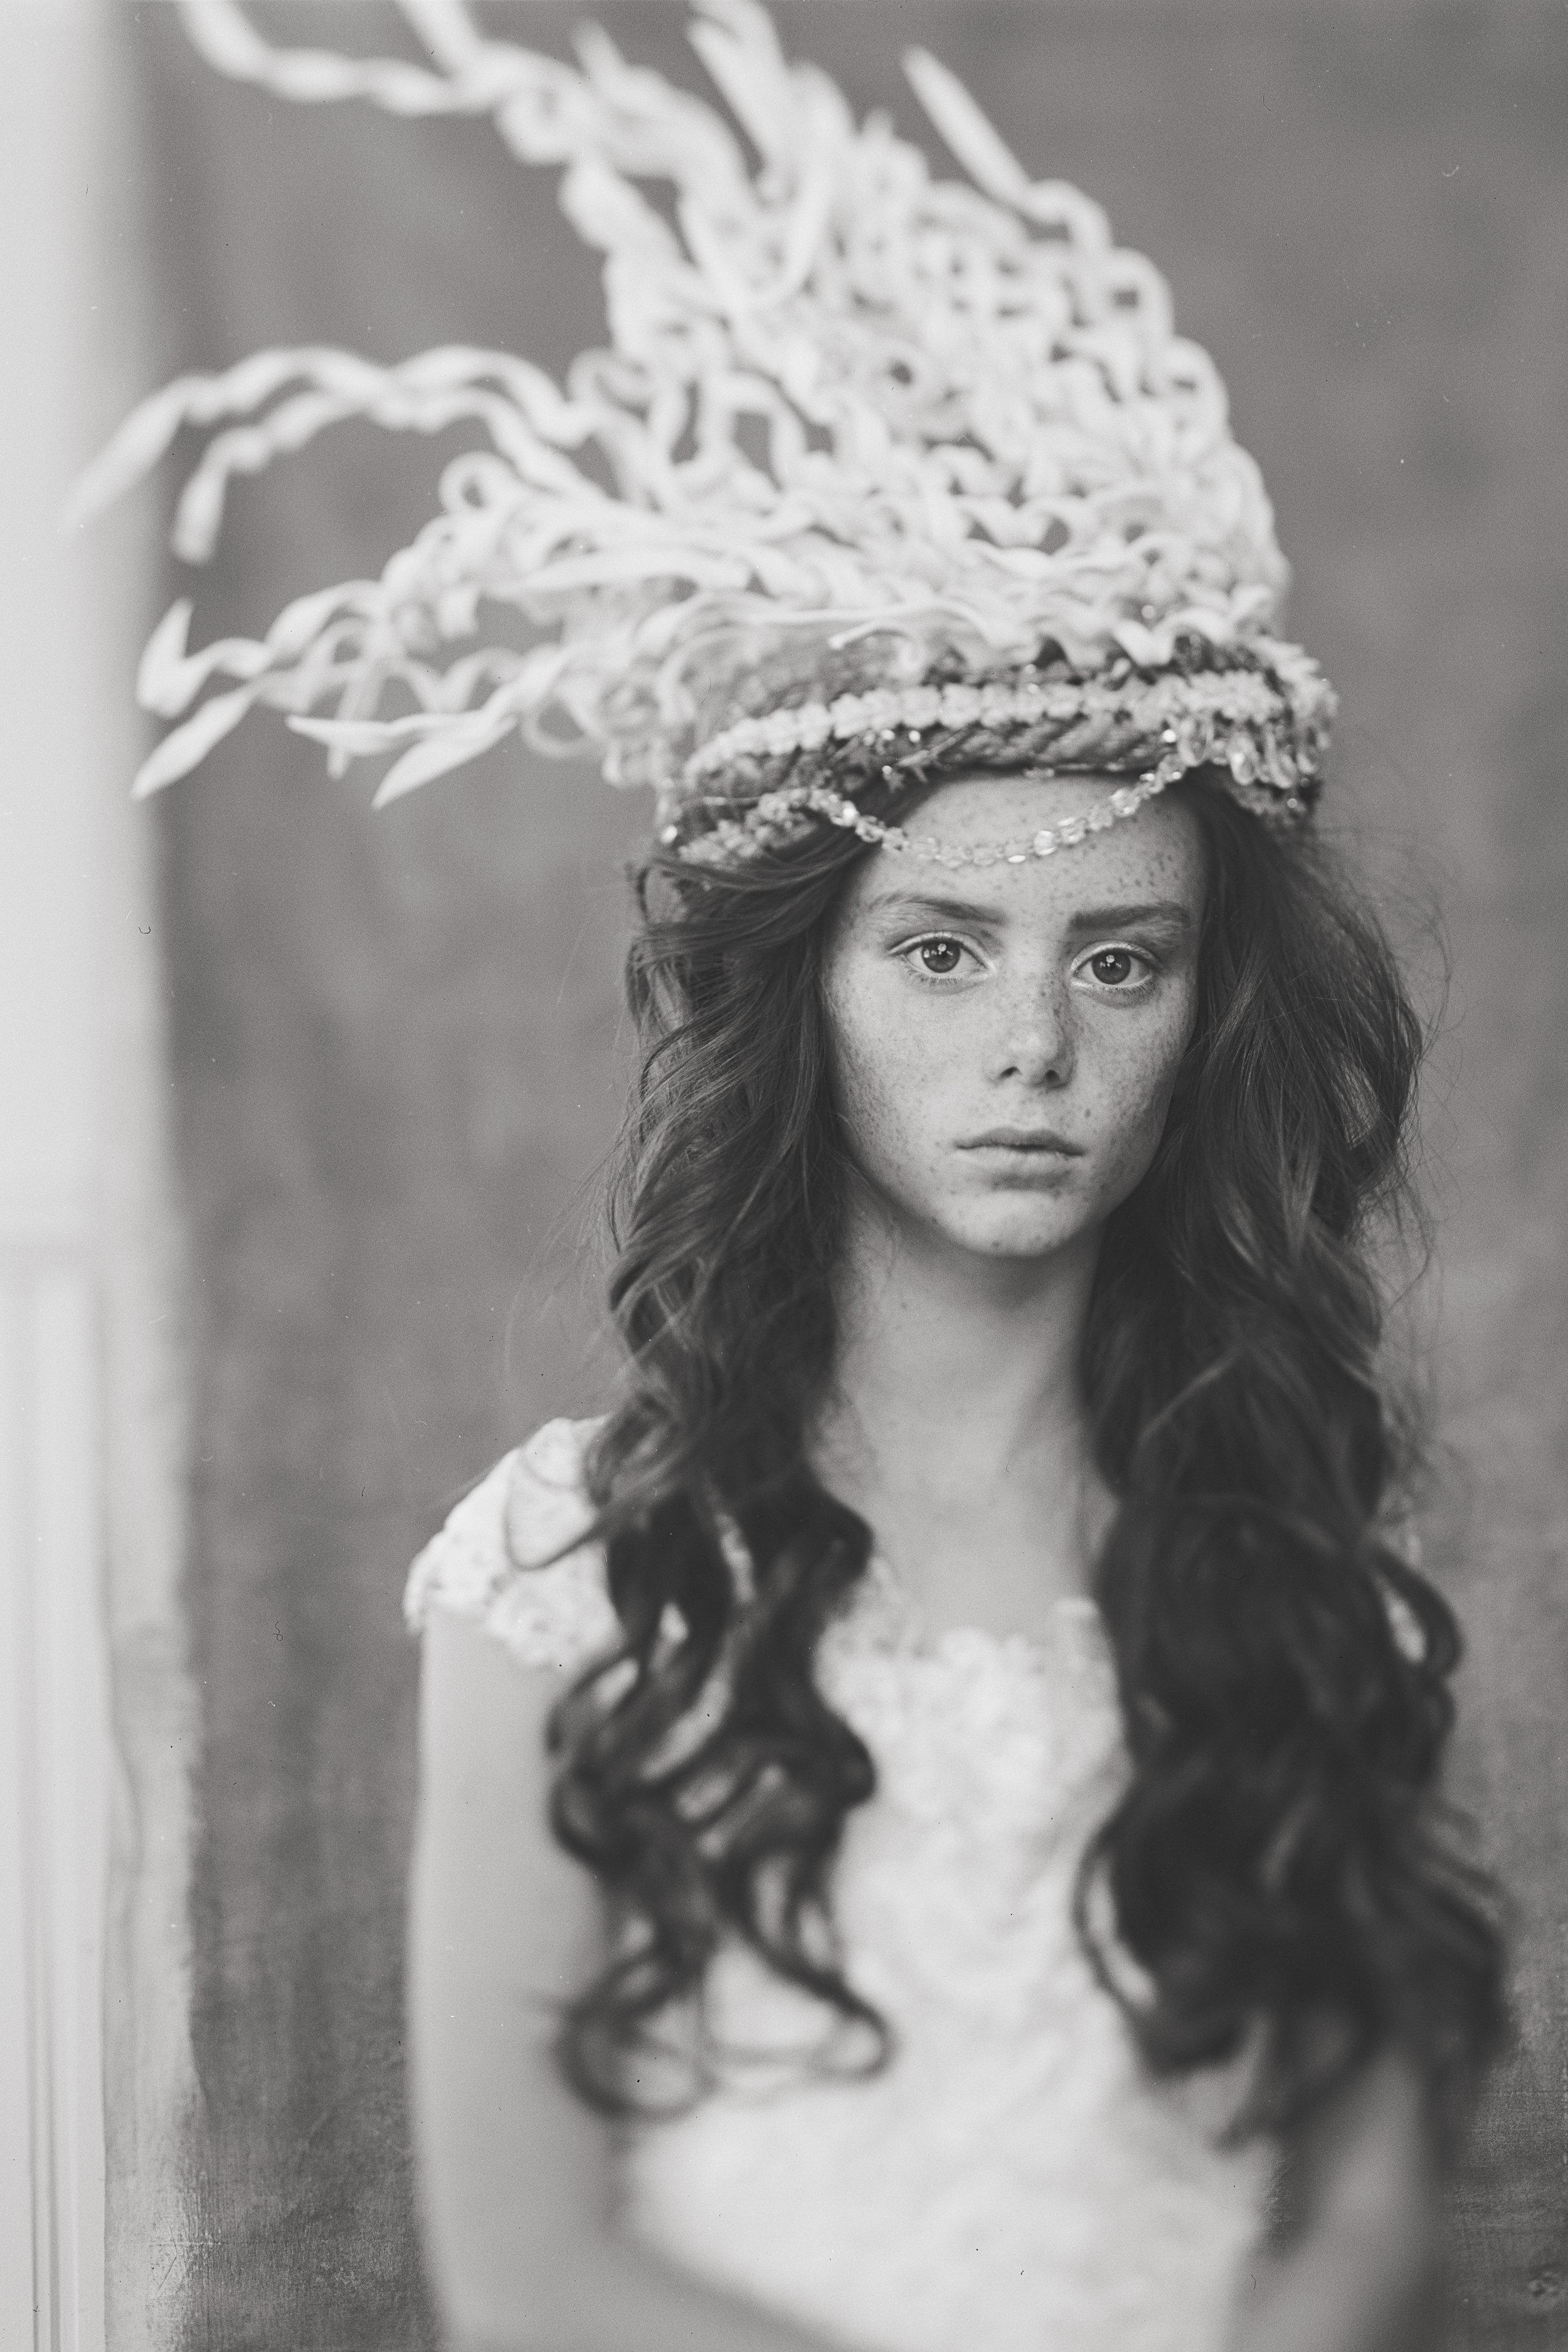 Marta-hewson-Emeryss-Teen-Portrait-Fashion-shoot- film photography 2.jpg